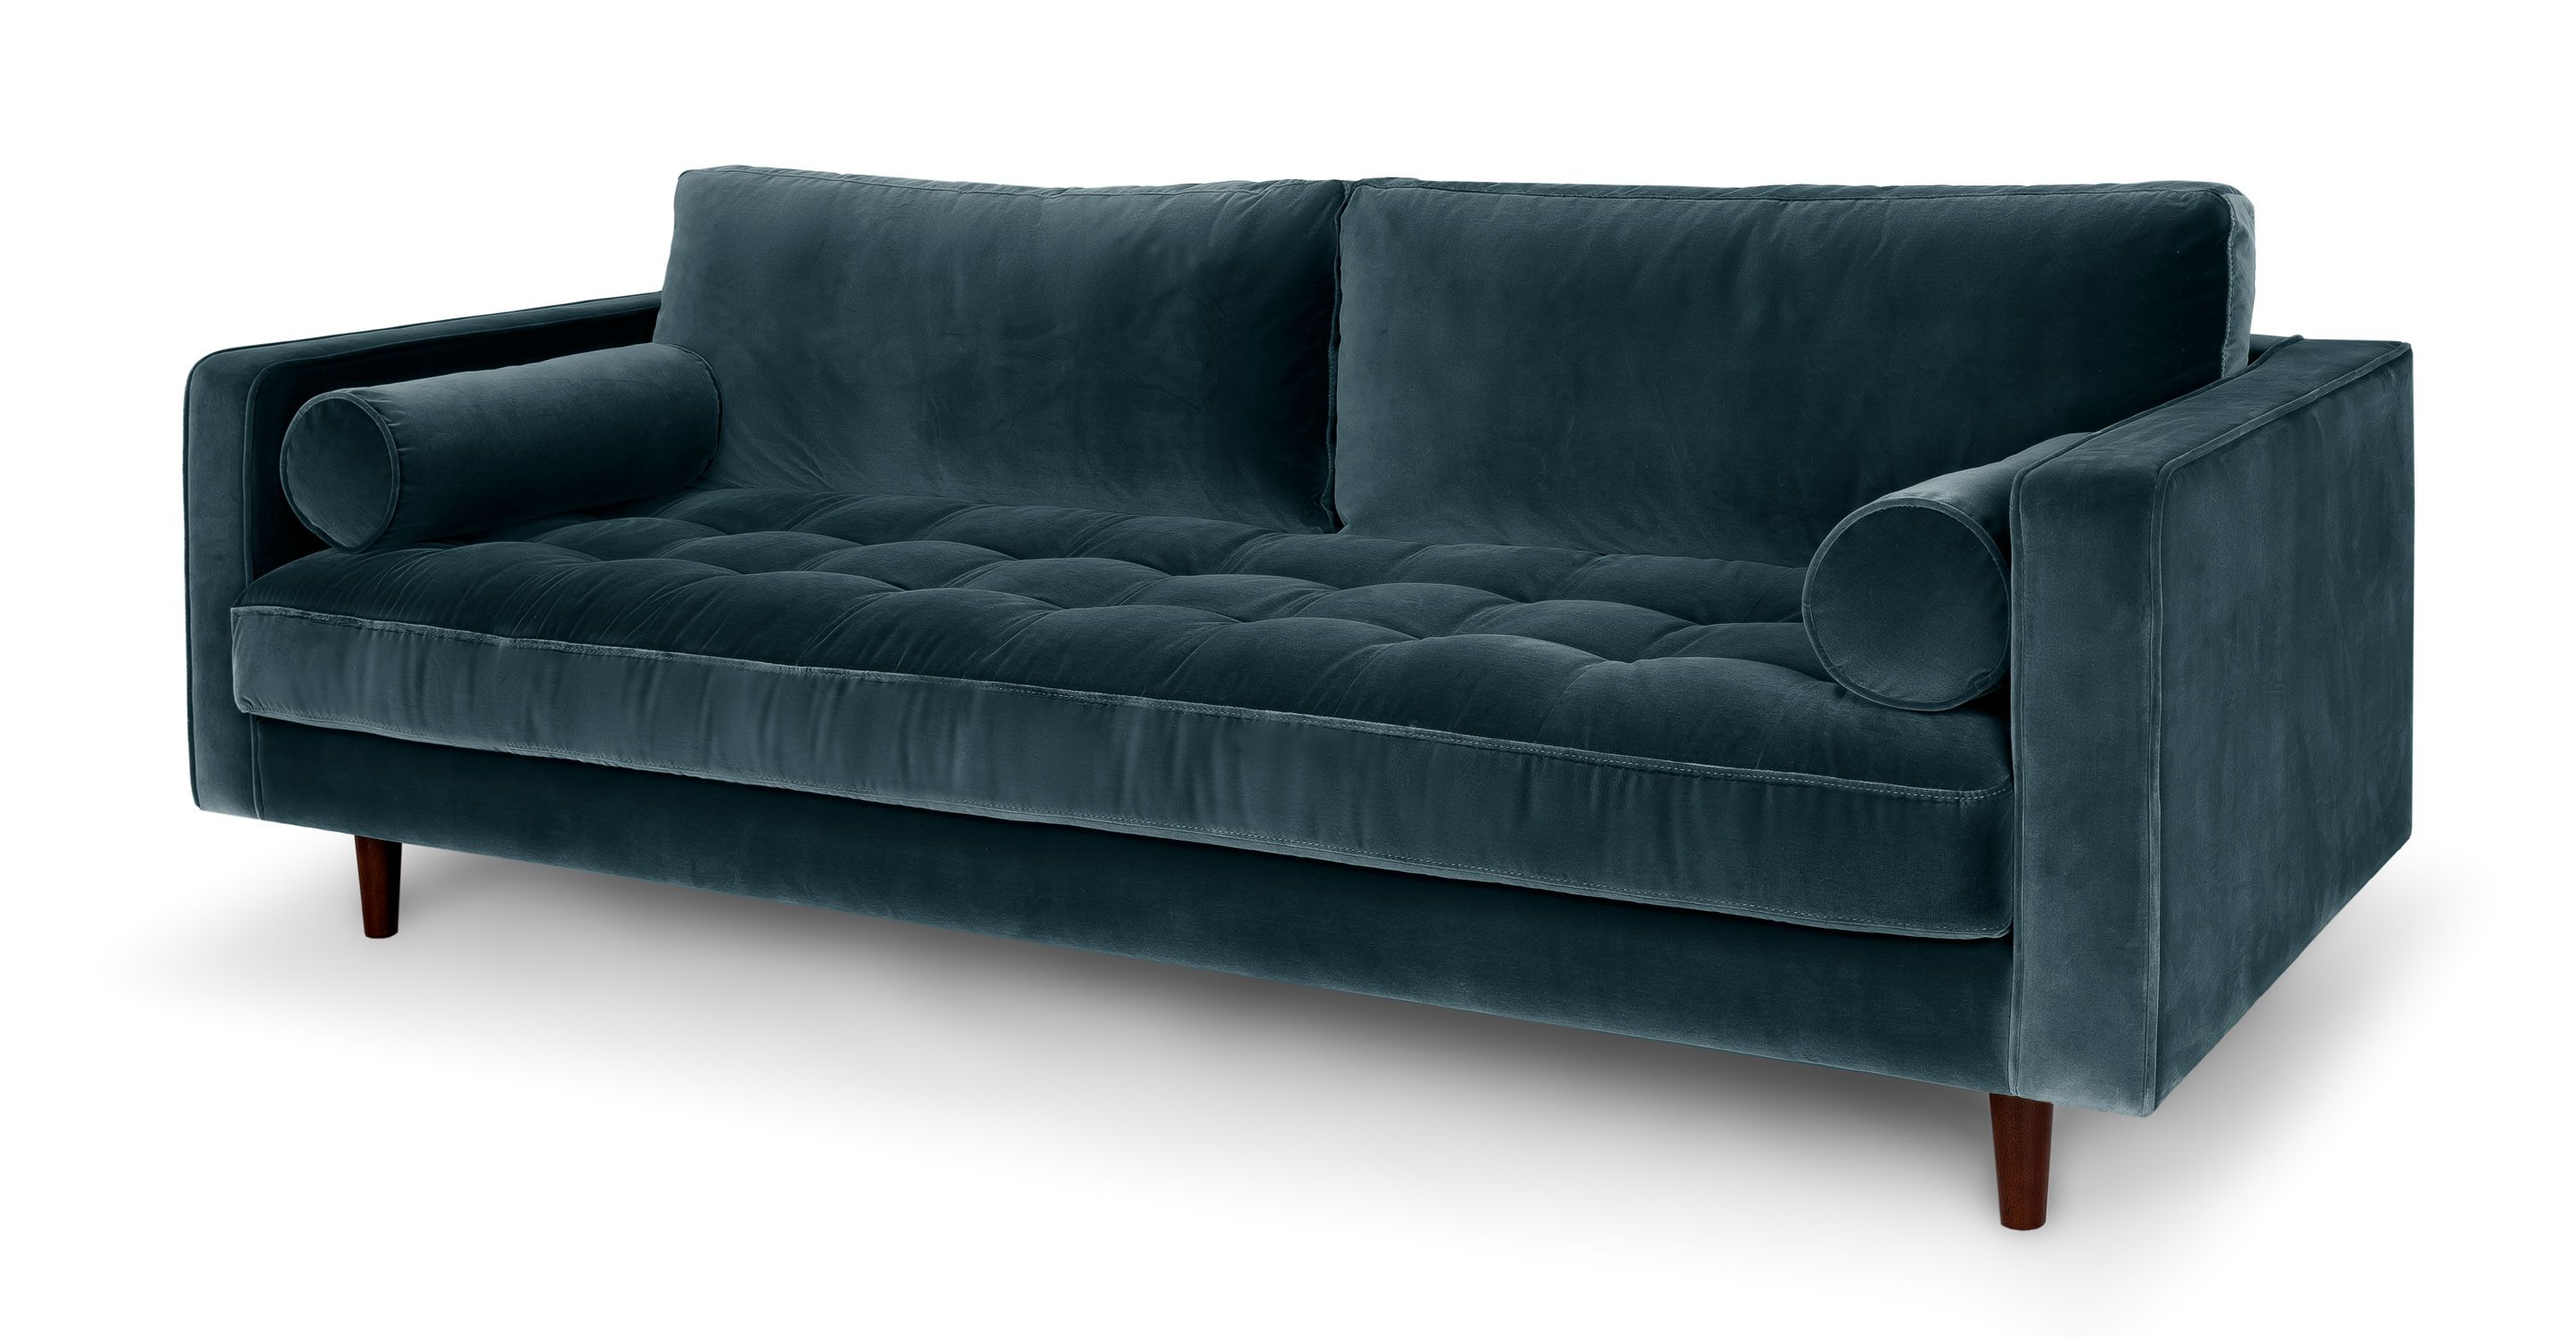 century furniture sofa quality chaise longue metro el corte ingles blue velvet tufted upholstered article sven